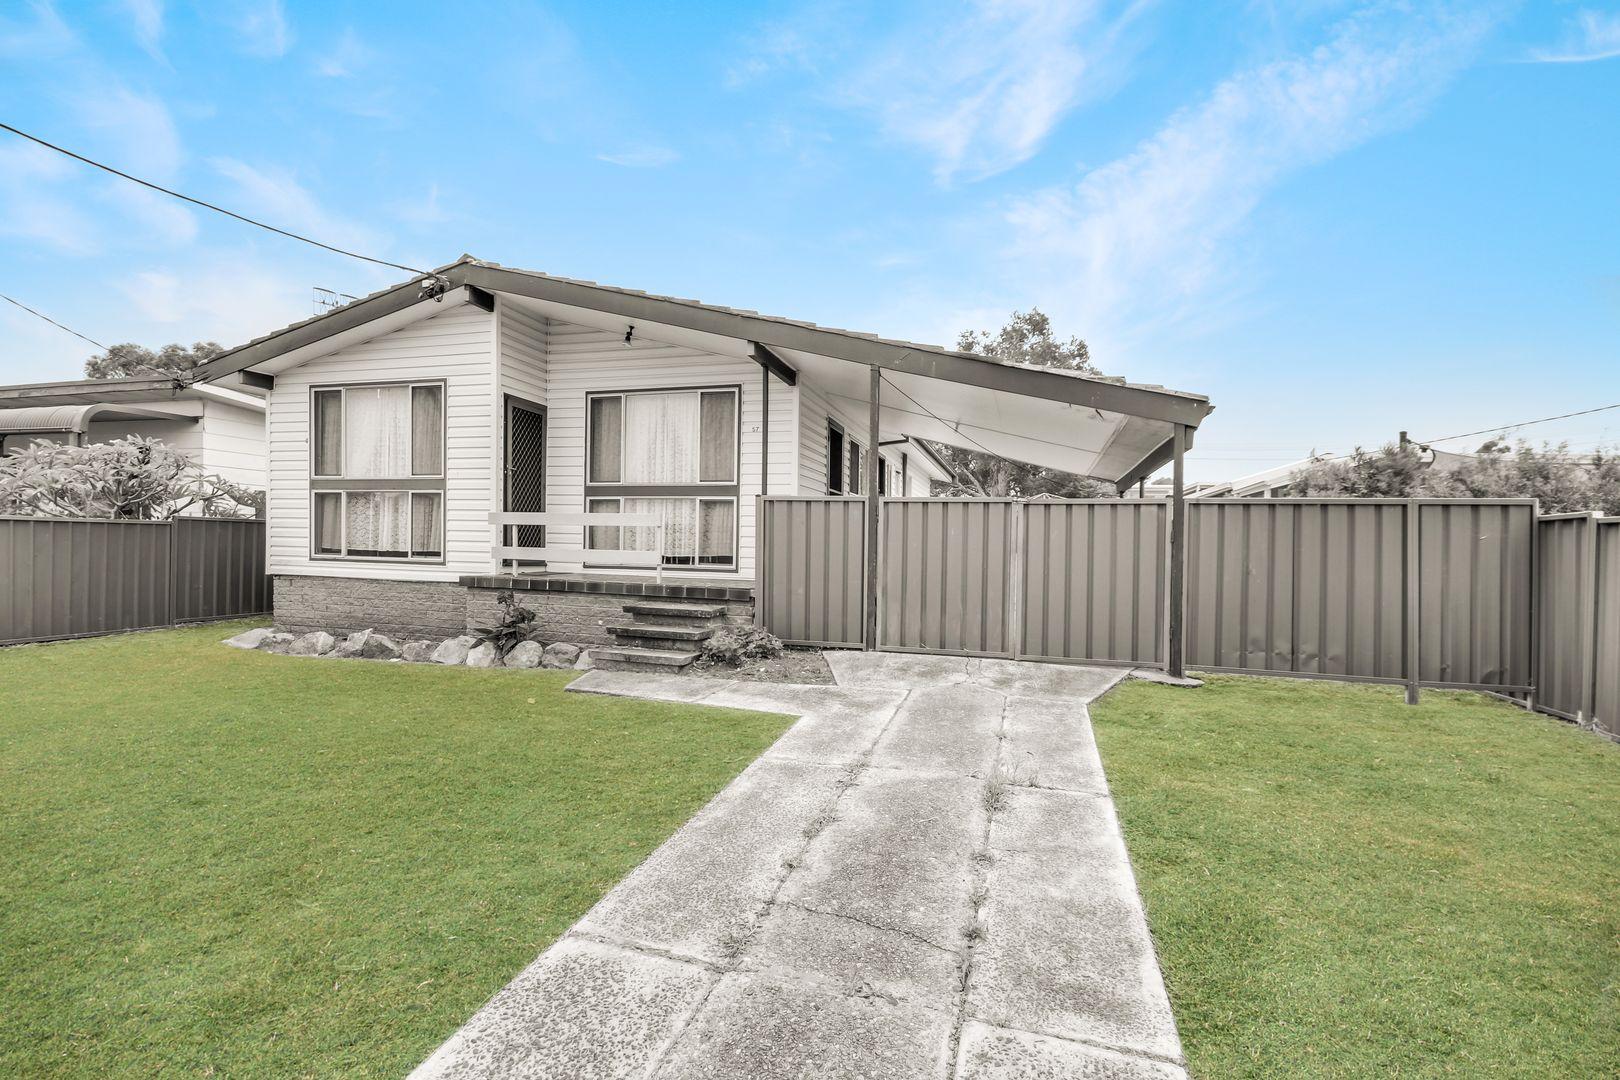 57 George Evans Road, Killarney Vale NSW 2261, Image 0